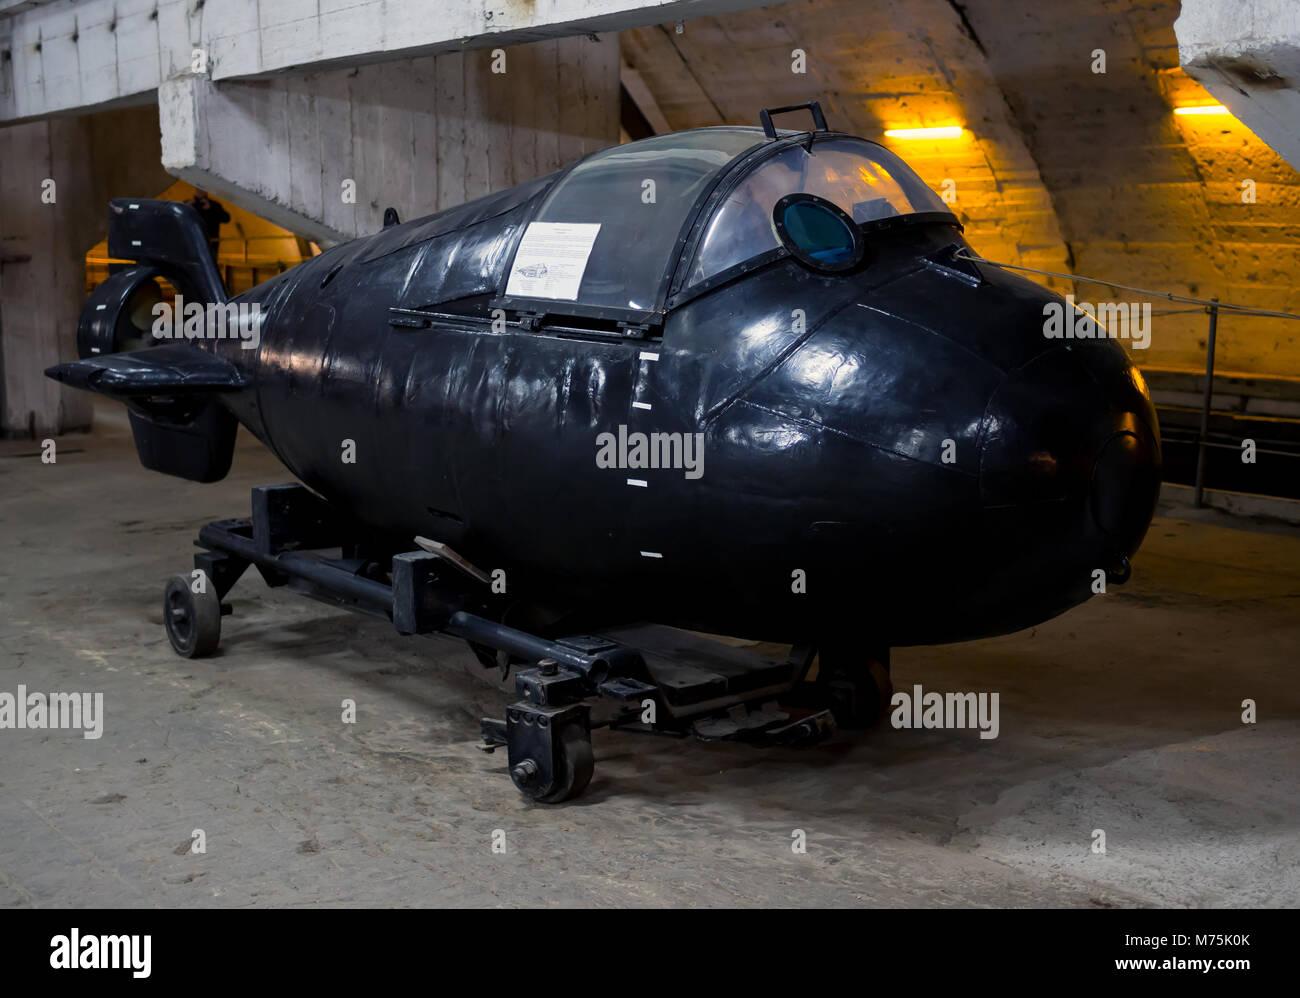 Balaklava, Russia - November 14, 2015: Super small submarine 'Triton', an underground museum complex Balaklava, - Stock Image